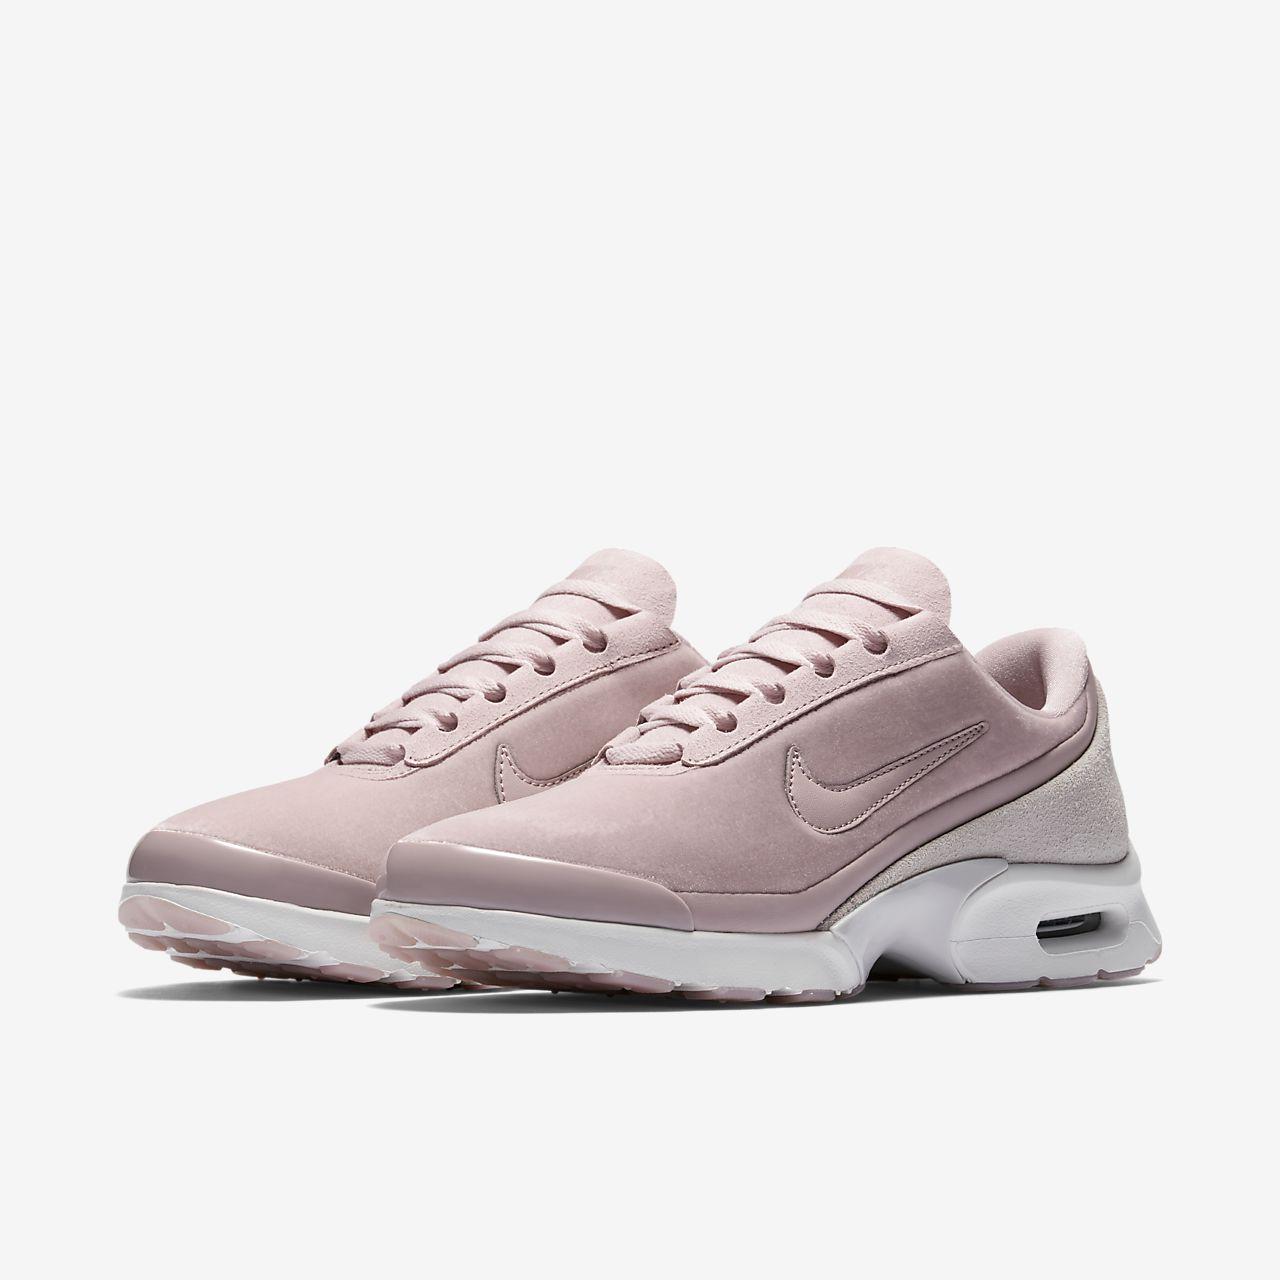 Nike W Nike Air Max Jewell Lx Damen 38 Rosa Freies Verschiffen Mode-Stil Billig Verkaufen Billig Fabrikpreis Verkauf 2018 Neueste U0fNvjUAW